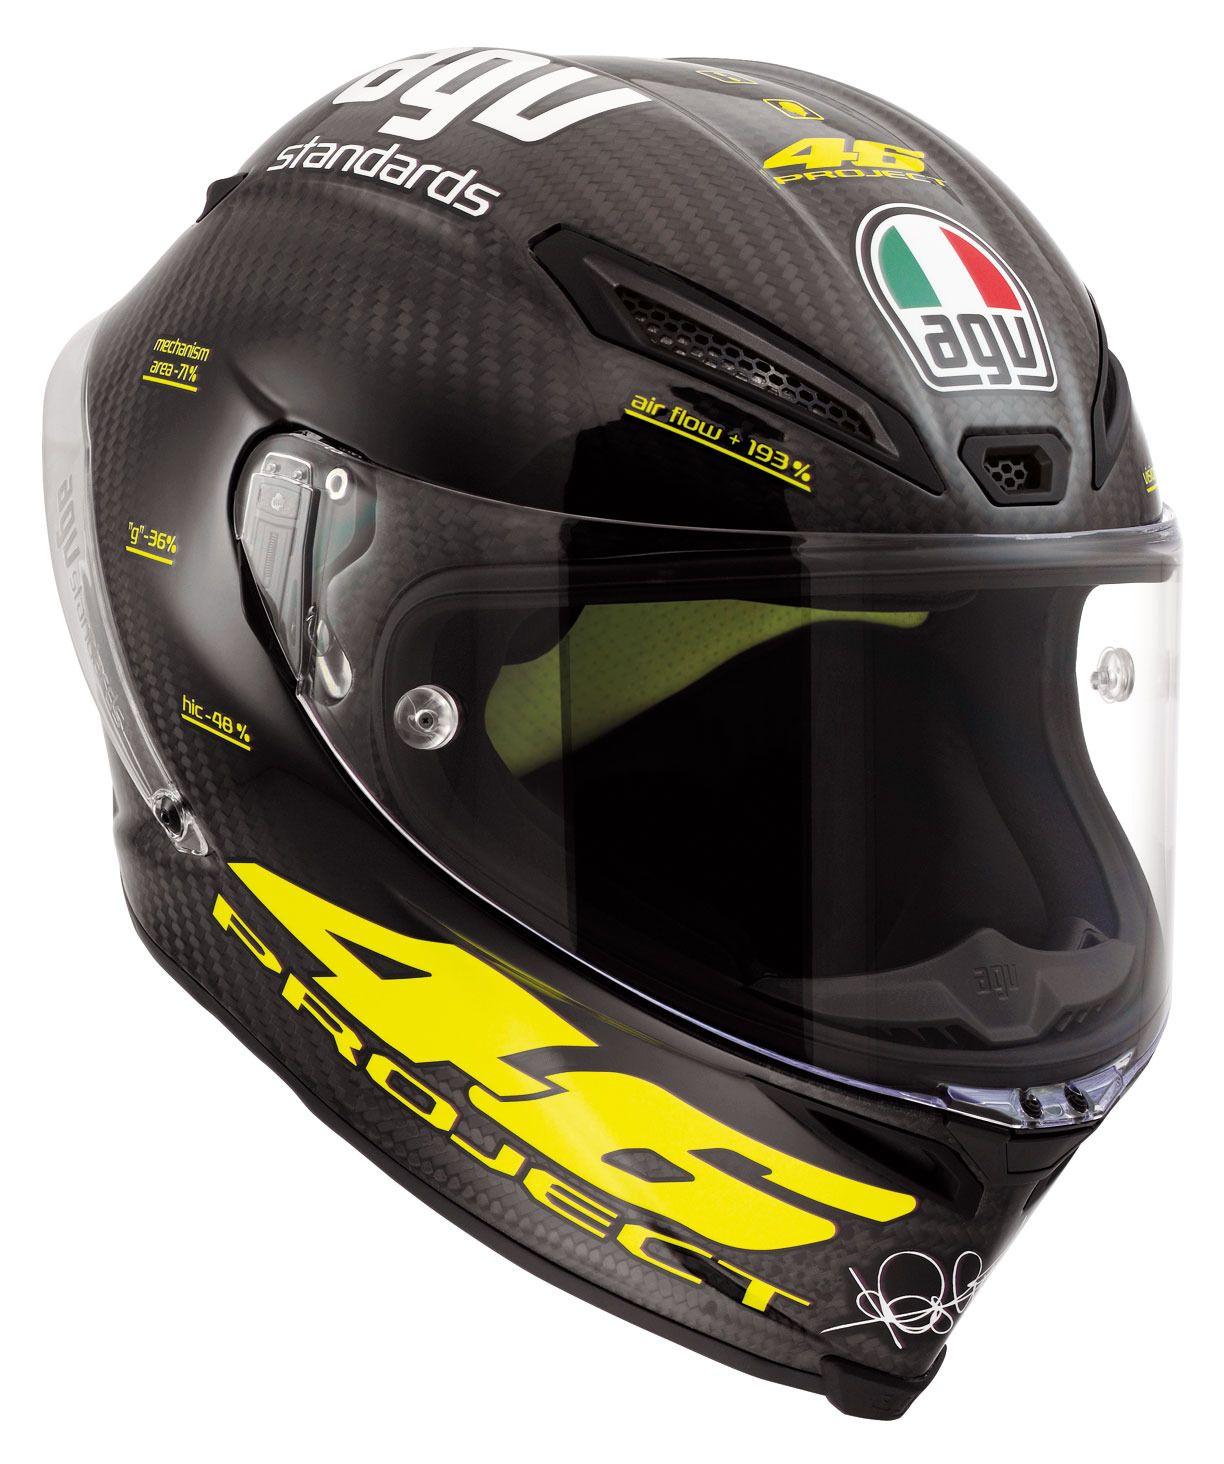 AGV Pista GP RR Carbon Performance Helmet - RevZilla